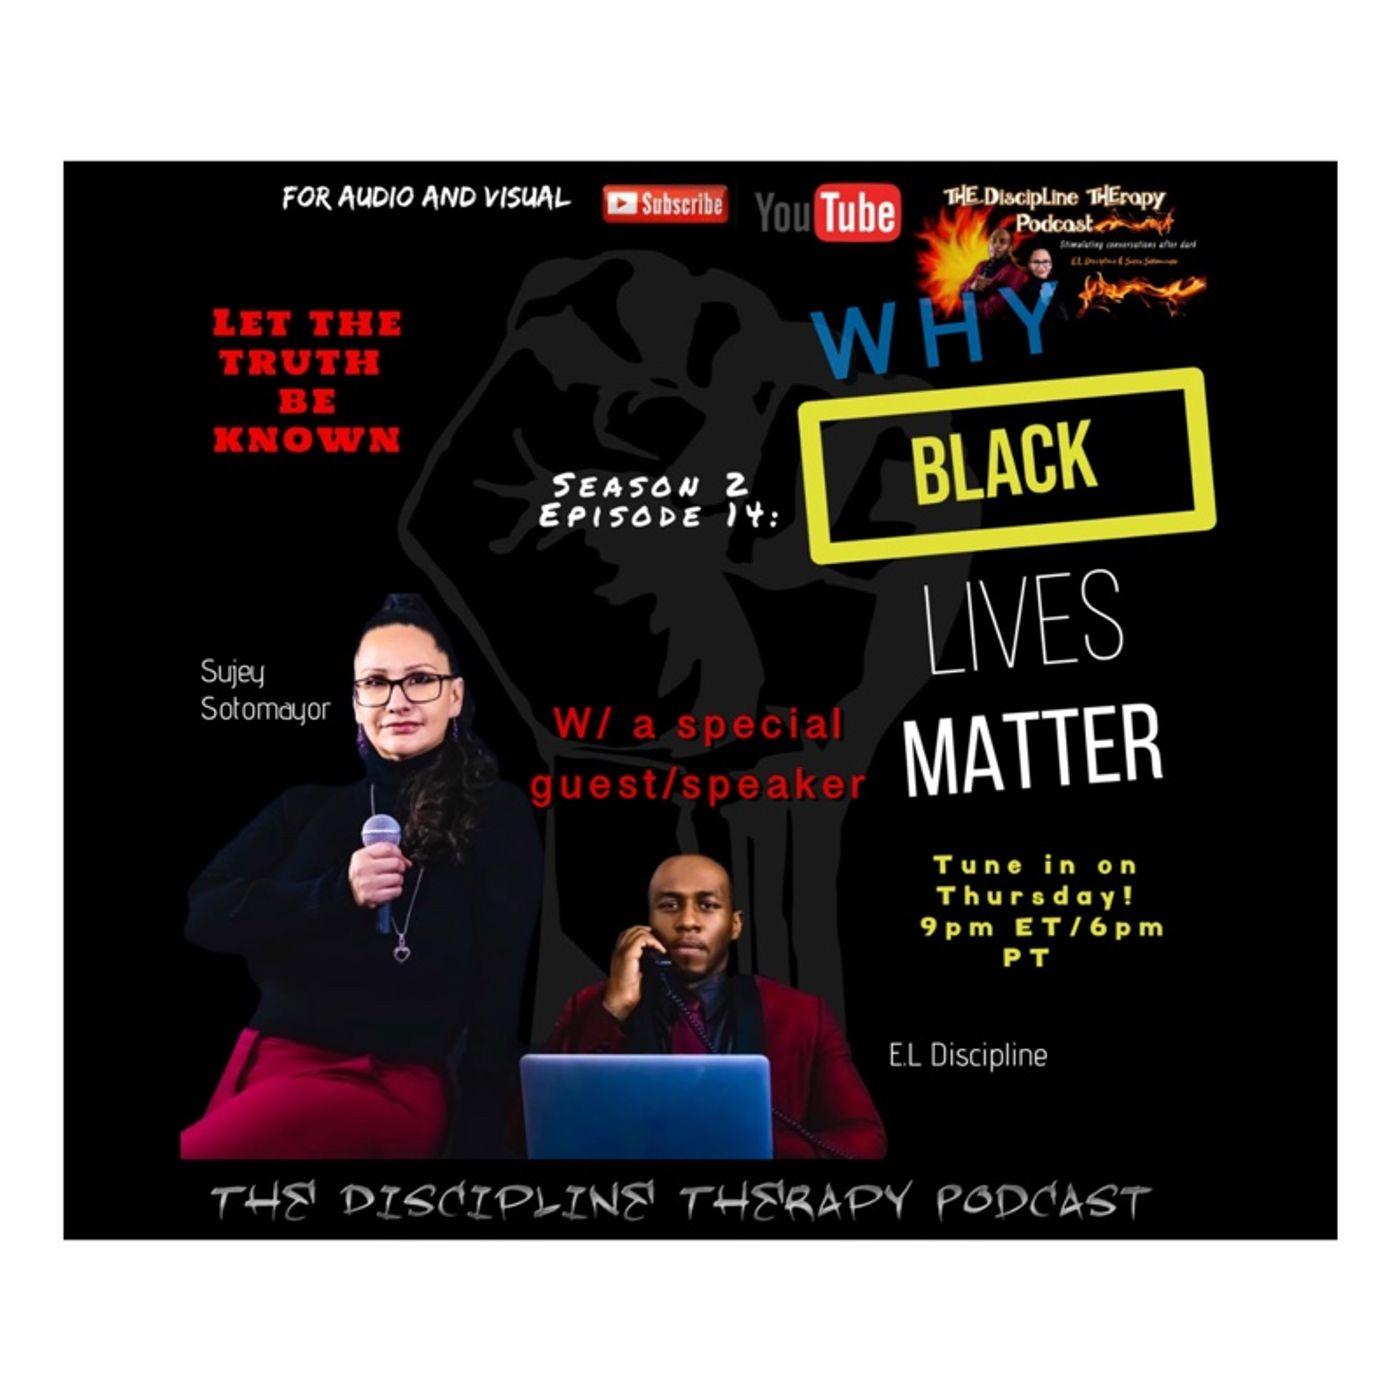 S2: Ep 14- Why Black Lives Matter